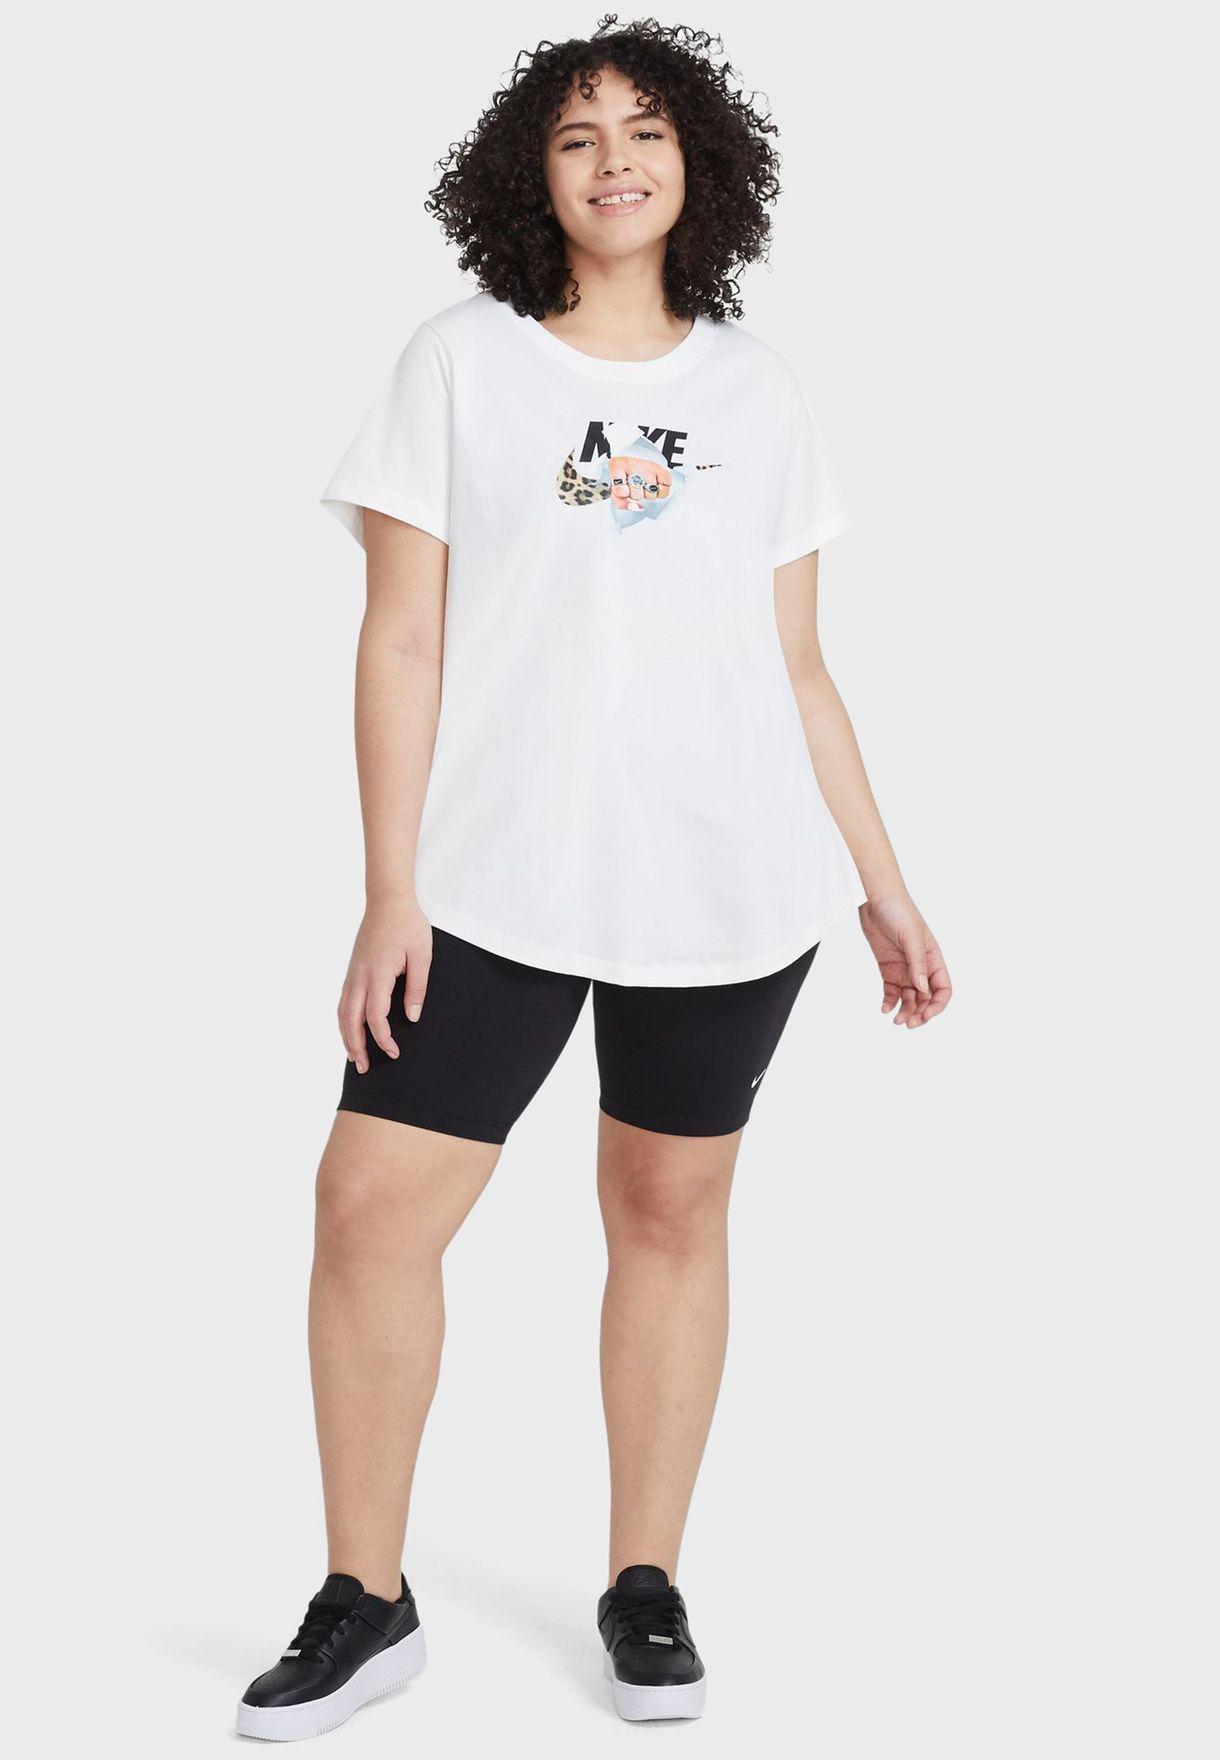 NSW Fierce T-Shirt